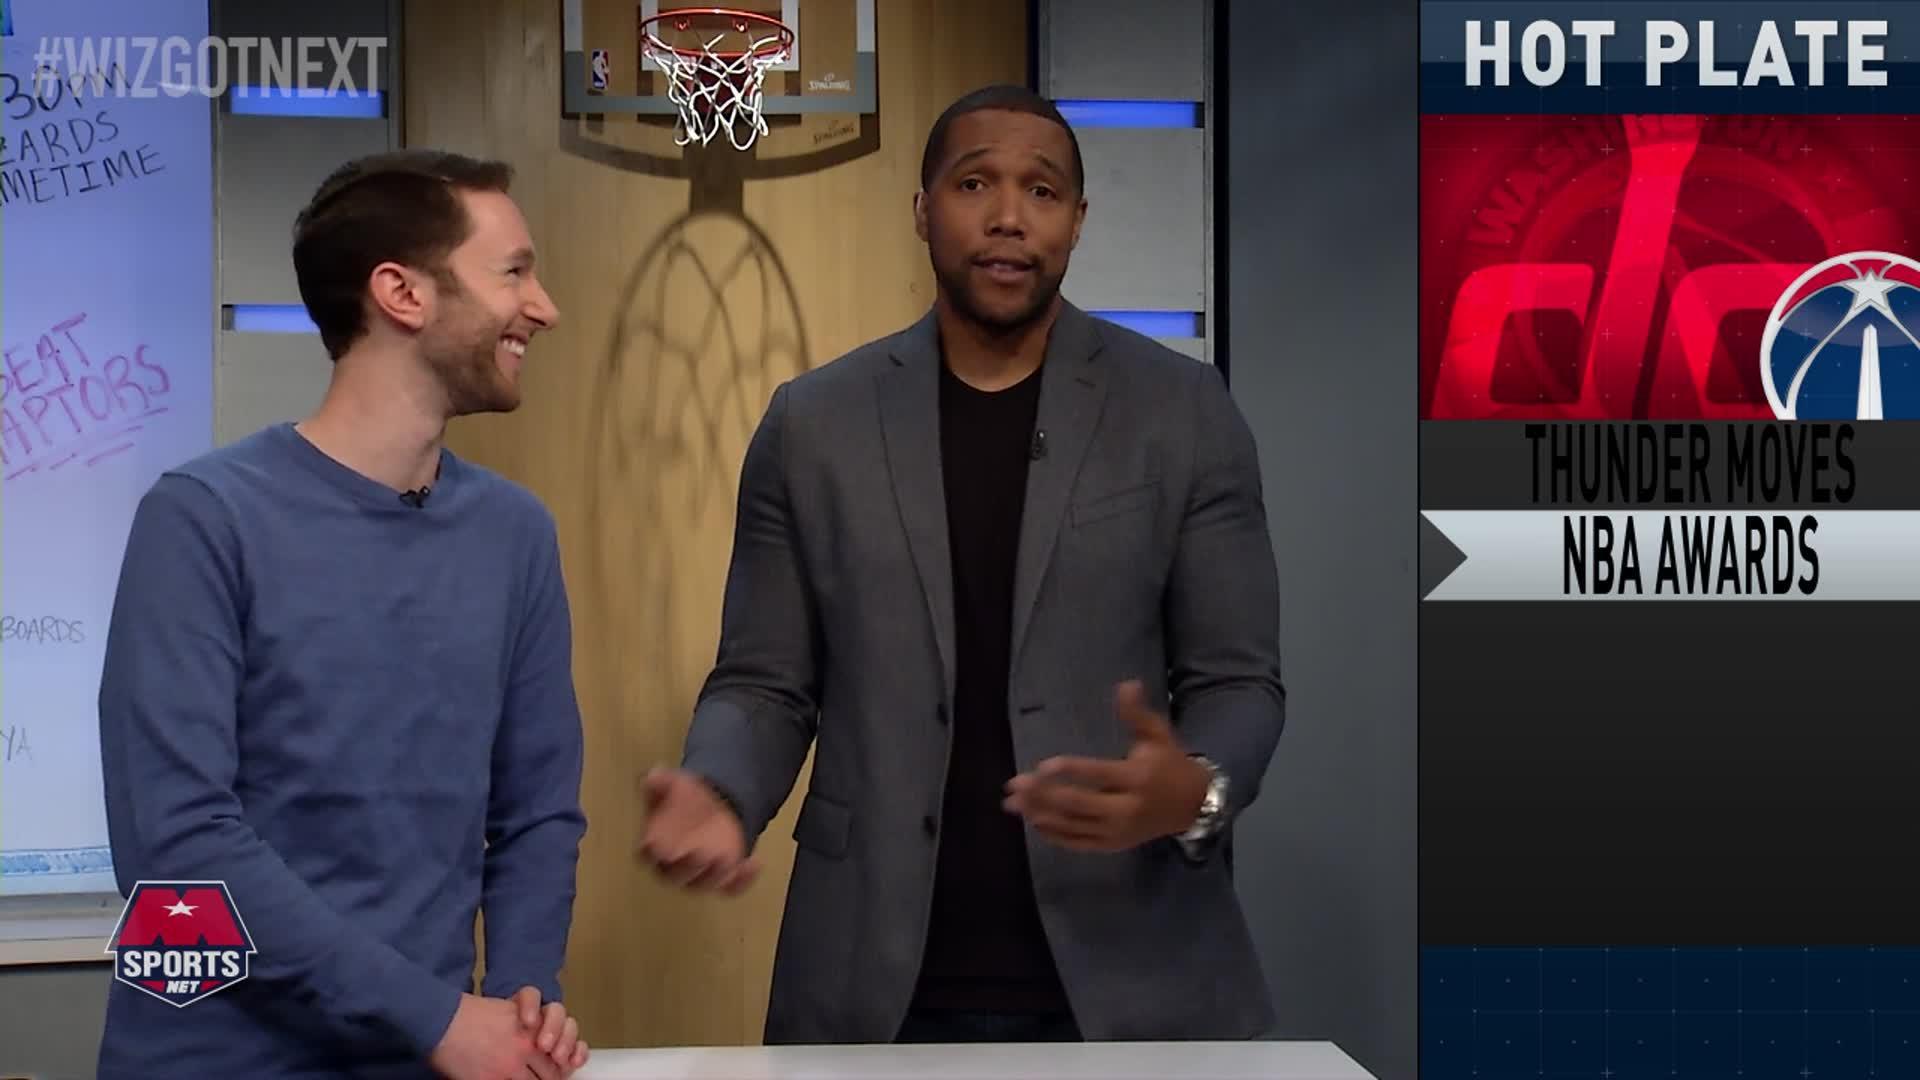 Wiz Got Next Pt 3 - Wizards vs Raptors 11-2-16